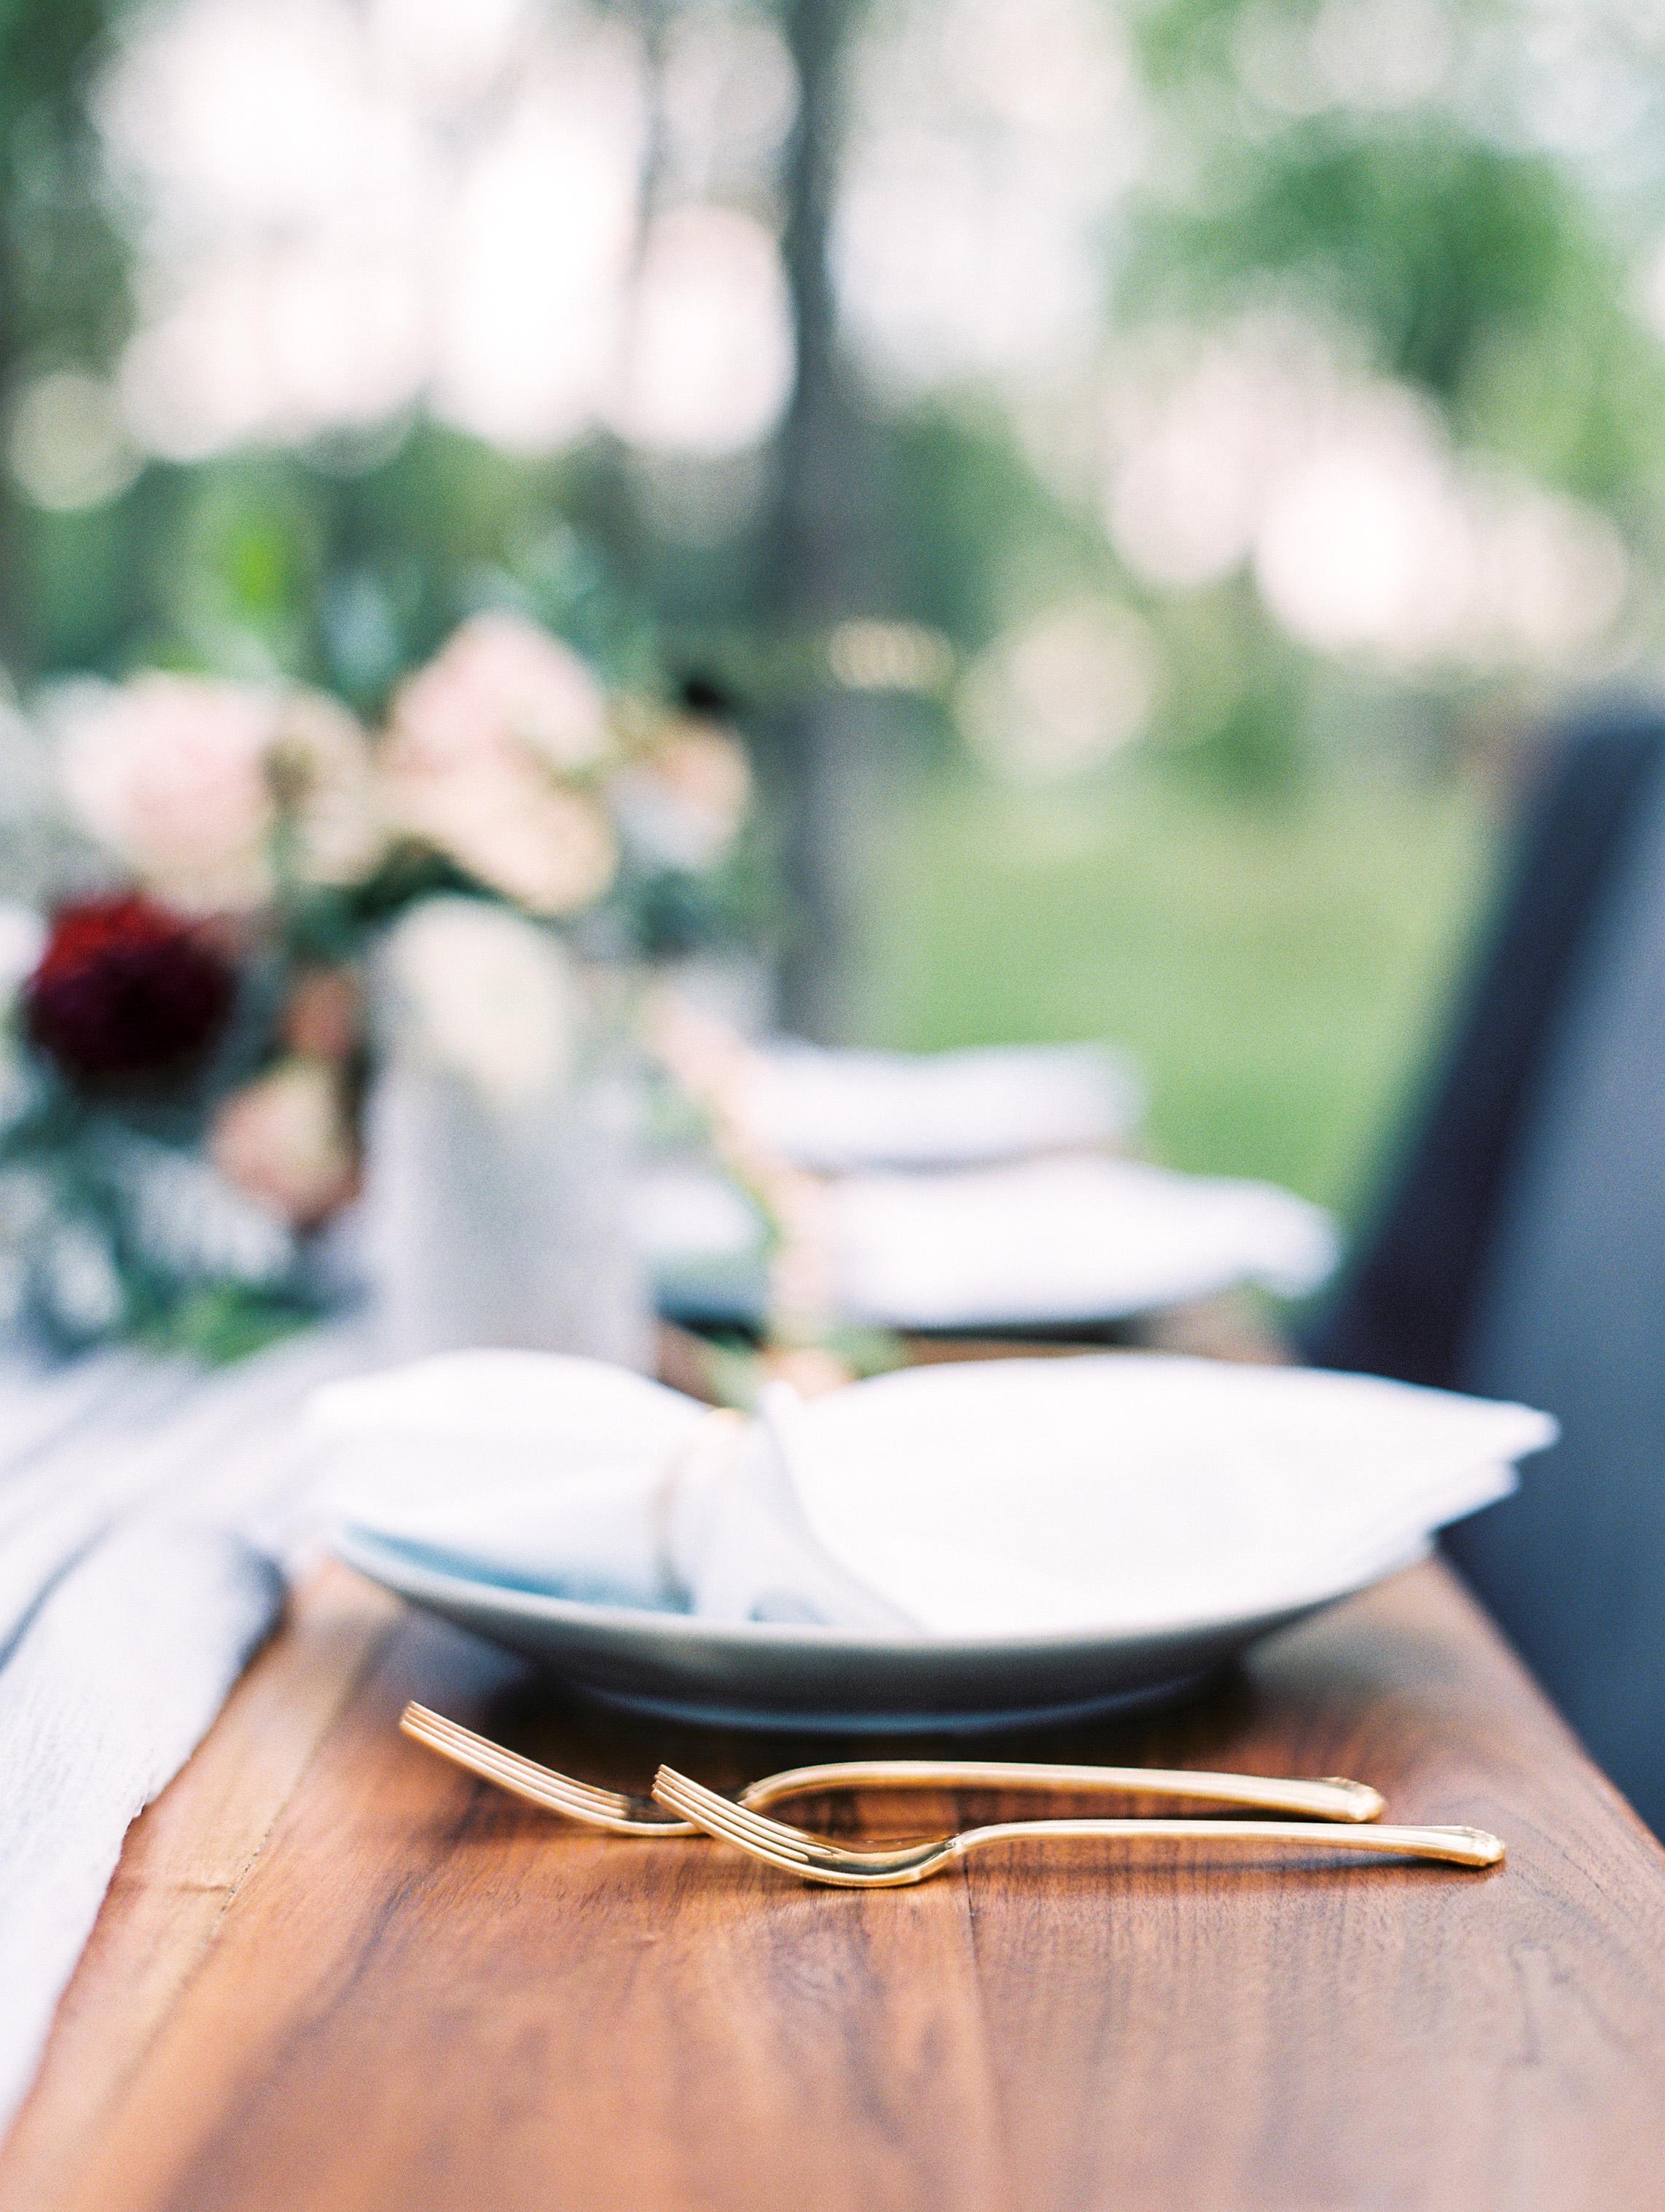 Dana-Fernandez-Photography-Houston-Wedding-Photographer-Film-100-Layer-Cake-Wedding-Inspiration-Destination-9.jpg